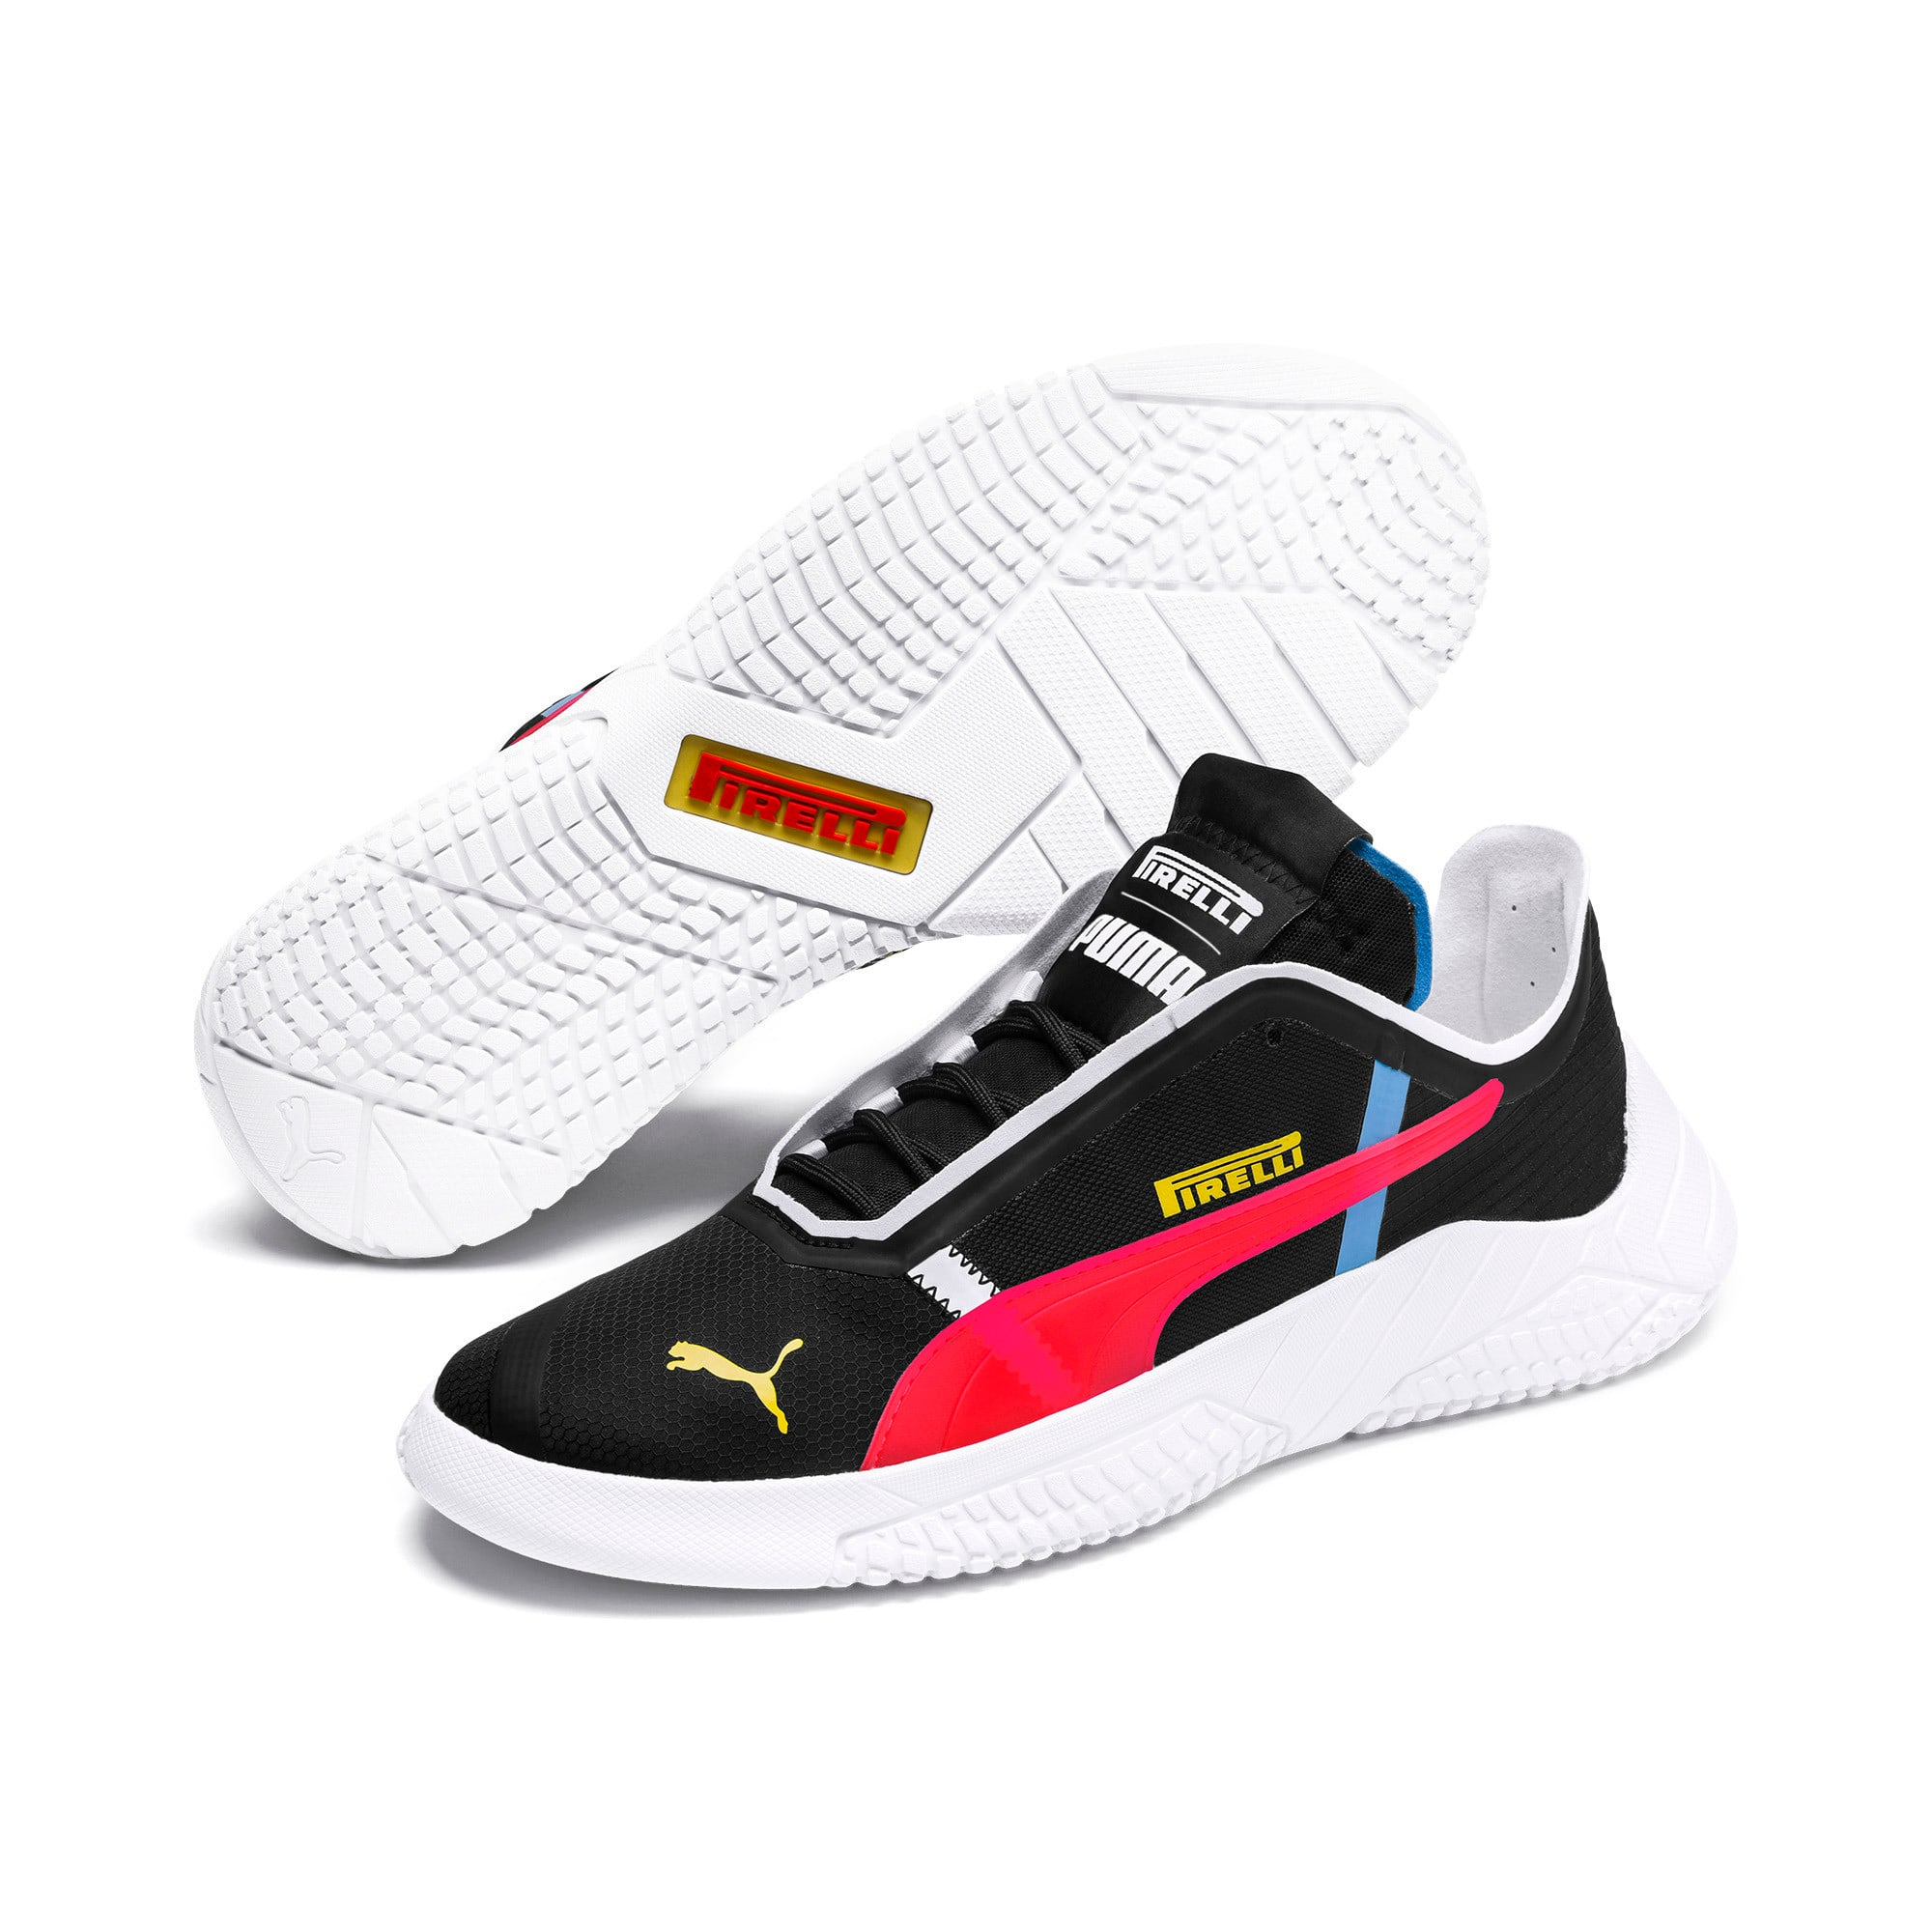 Thumbnail 3 of Replicat-X Pirelli v2 Motorsport Shoes, Black-Puma Red- White, medium